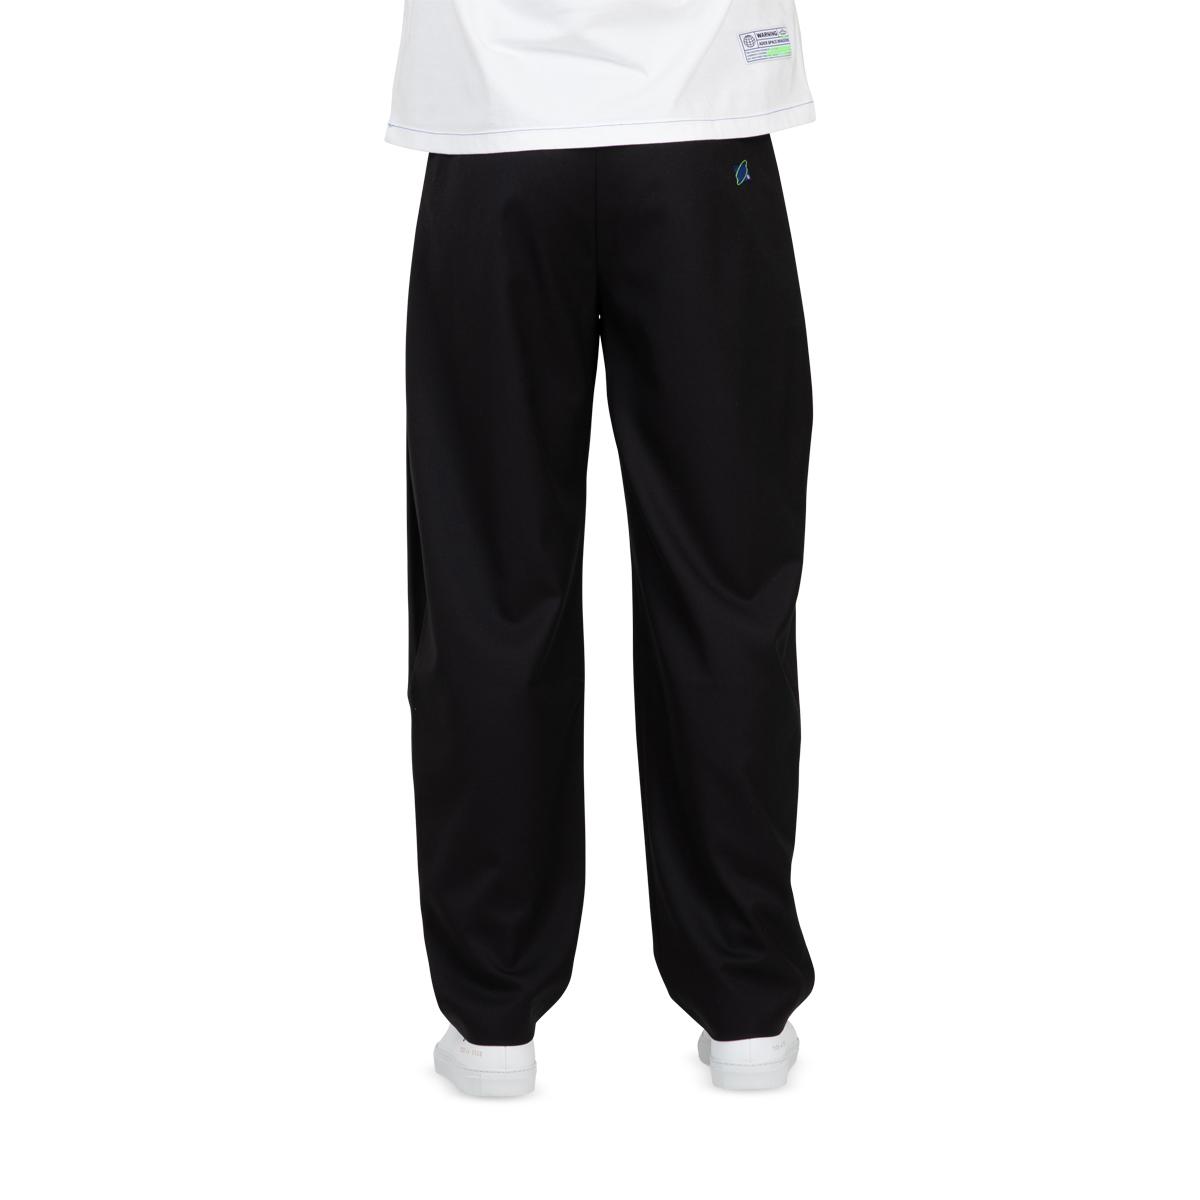 ADER Error Kustic Trousers